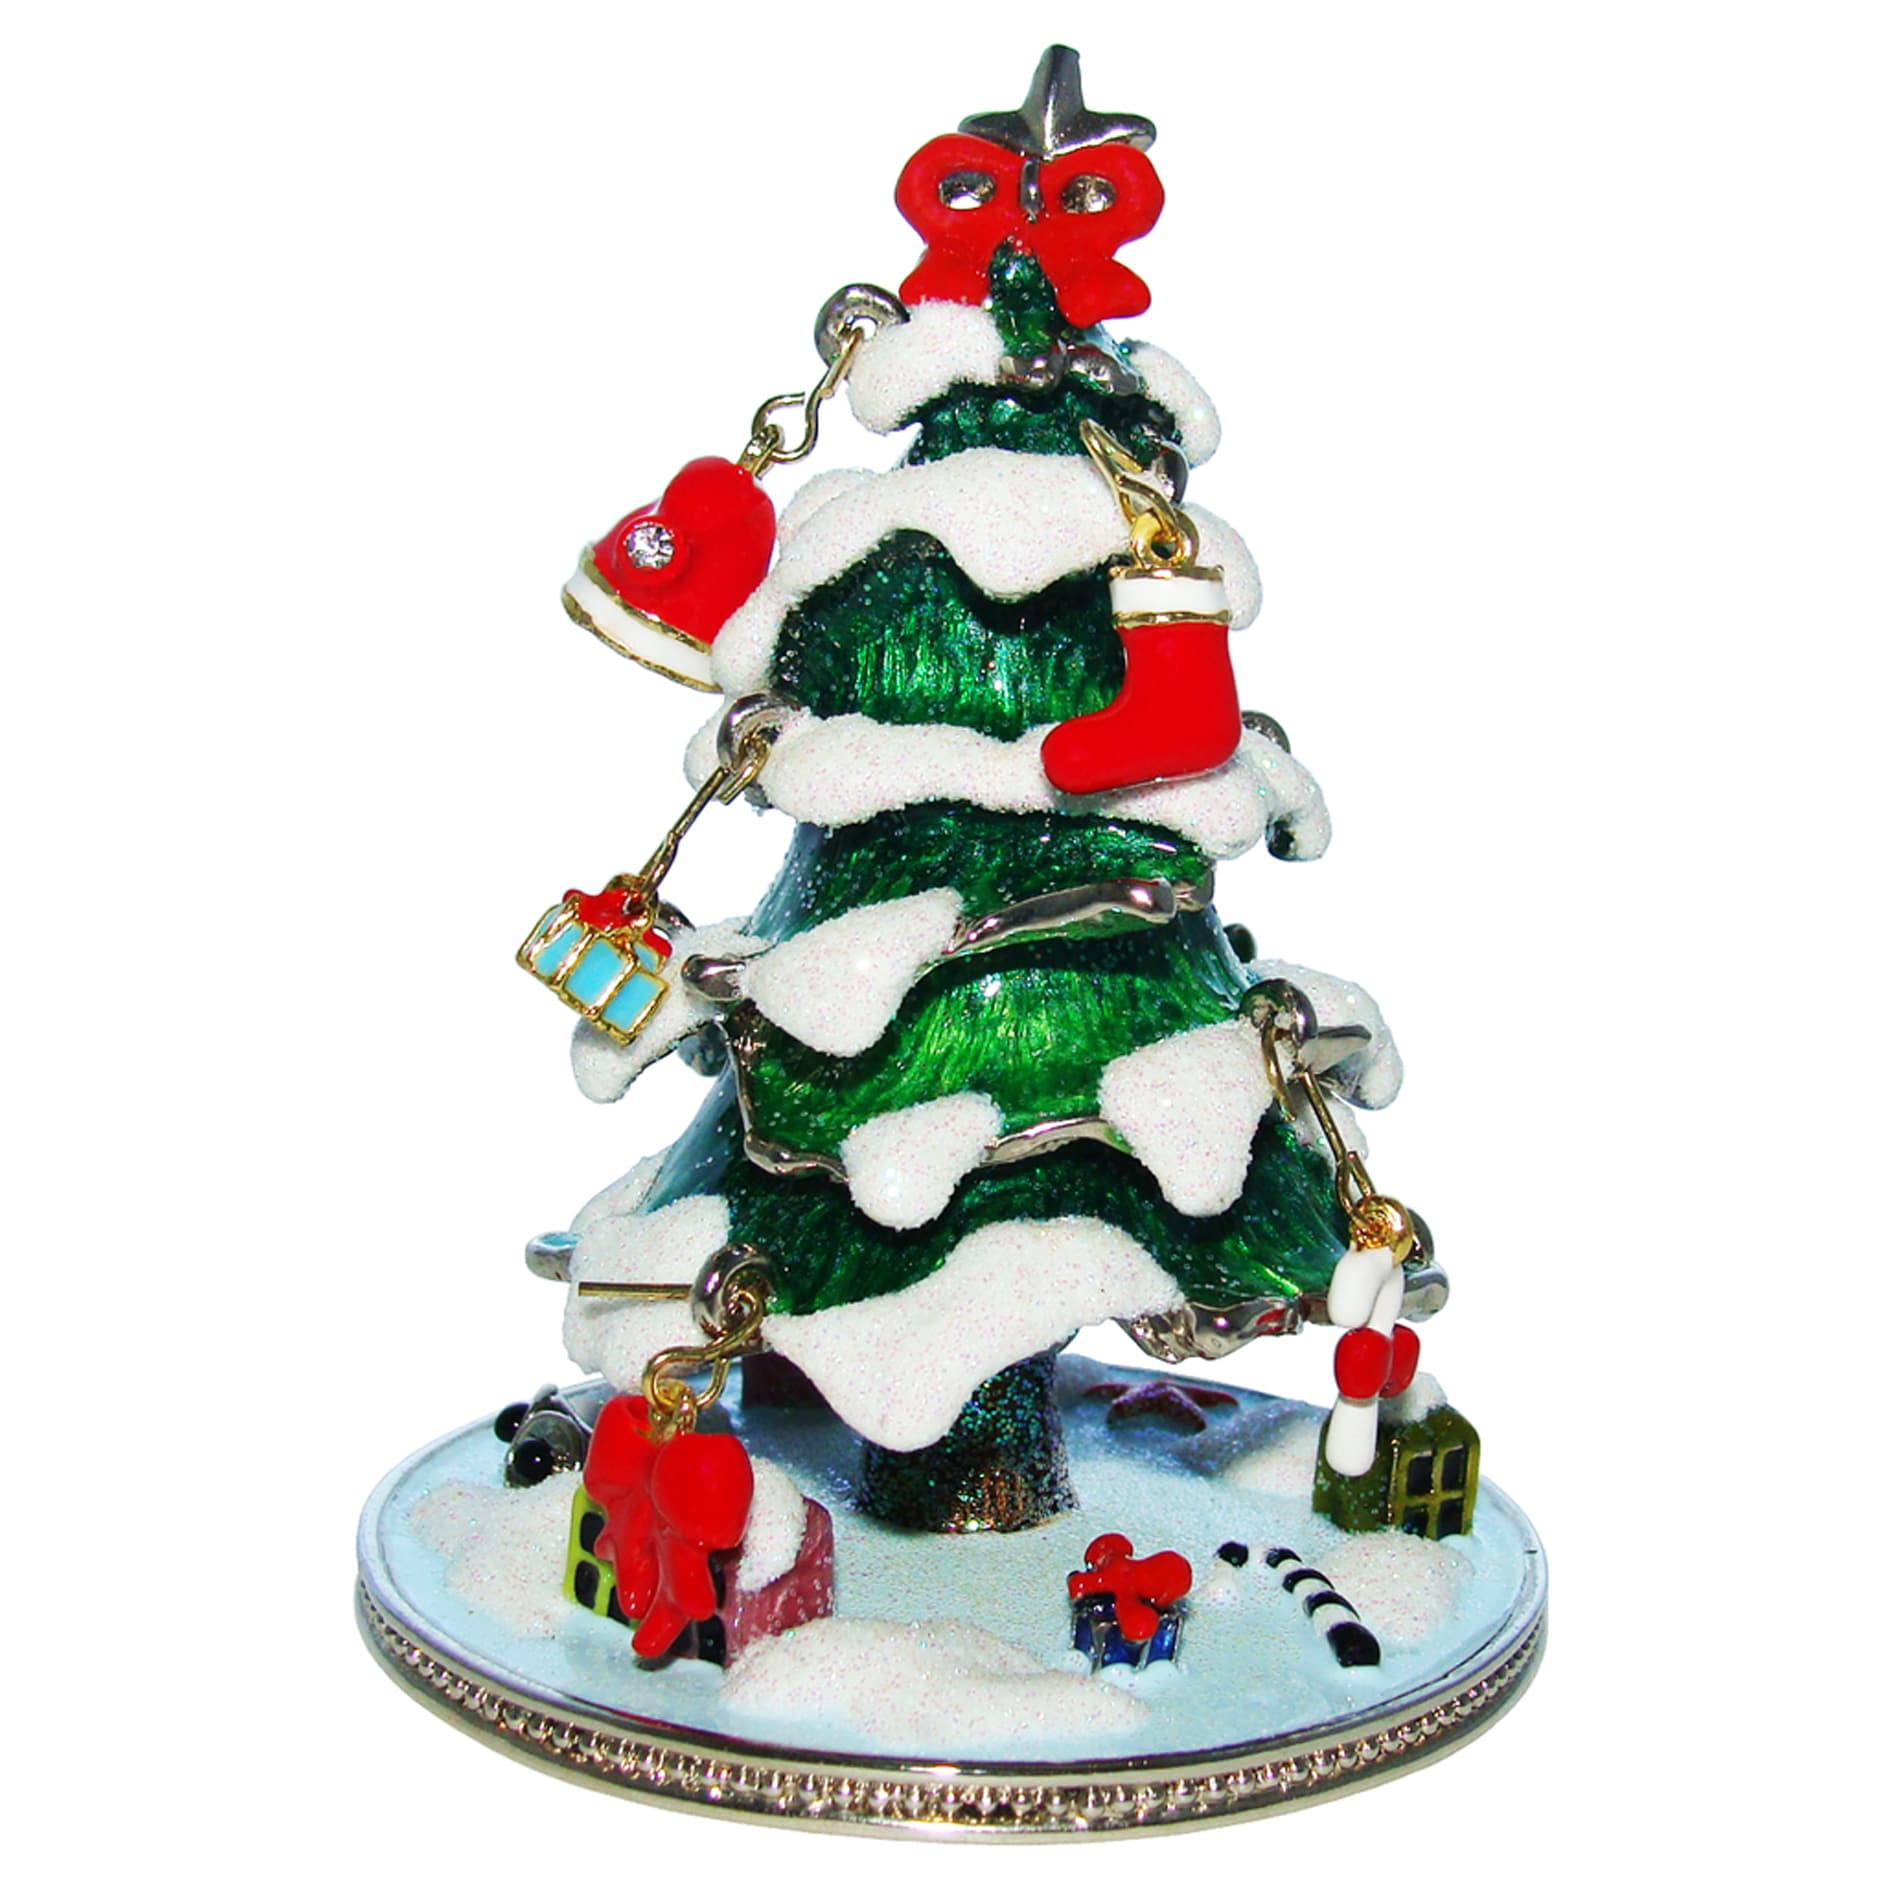 Objet d'art 'The First Noel' Christmas Tree Trinket Box